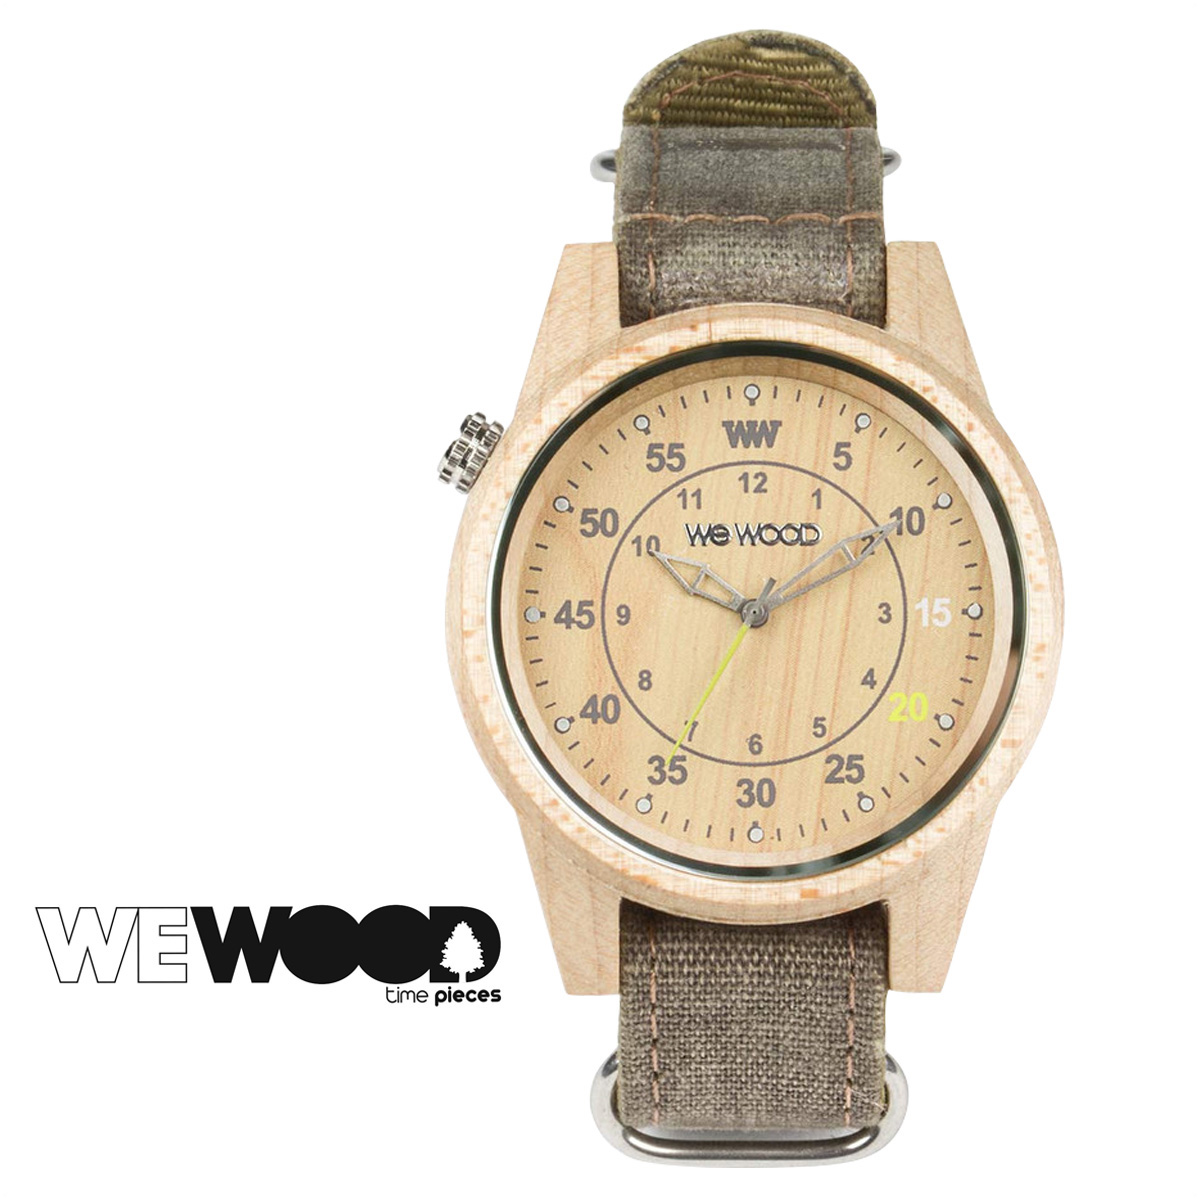 WEWOOD 腕時計 レディース ウィーウッド DUHBE ベージュ チョコレート BEIGE CHOCOLATE メンズ